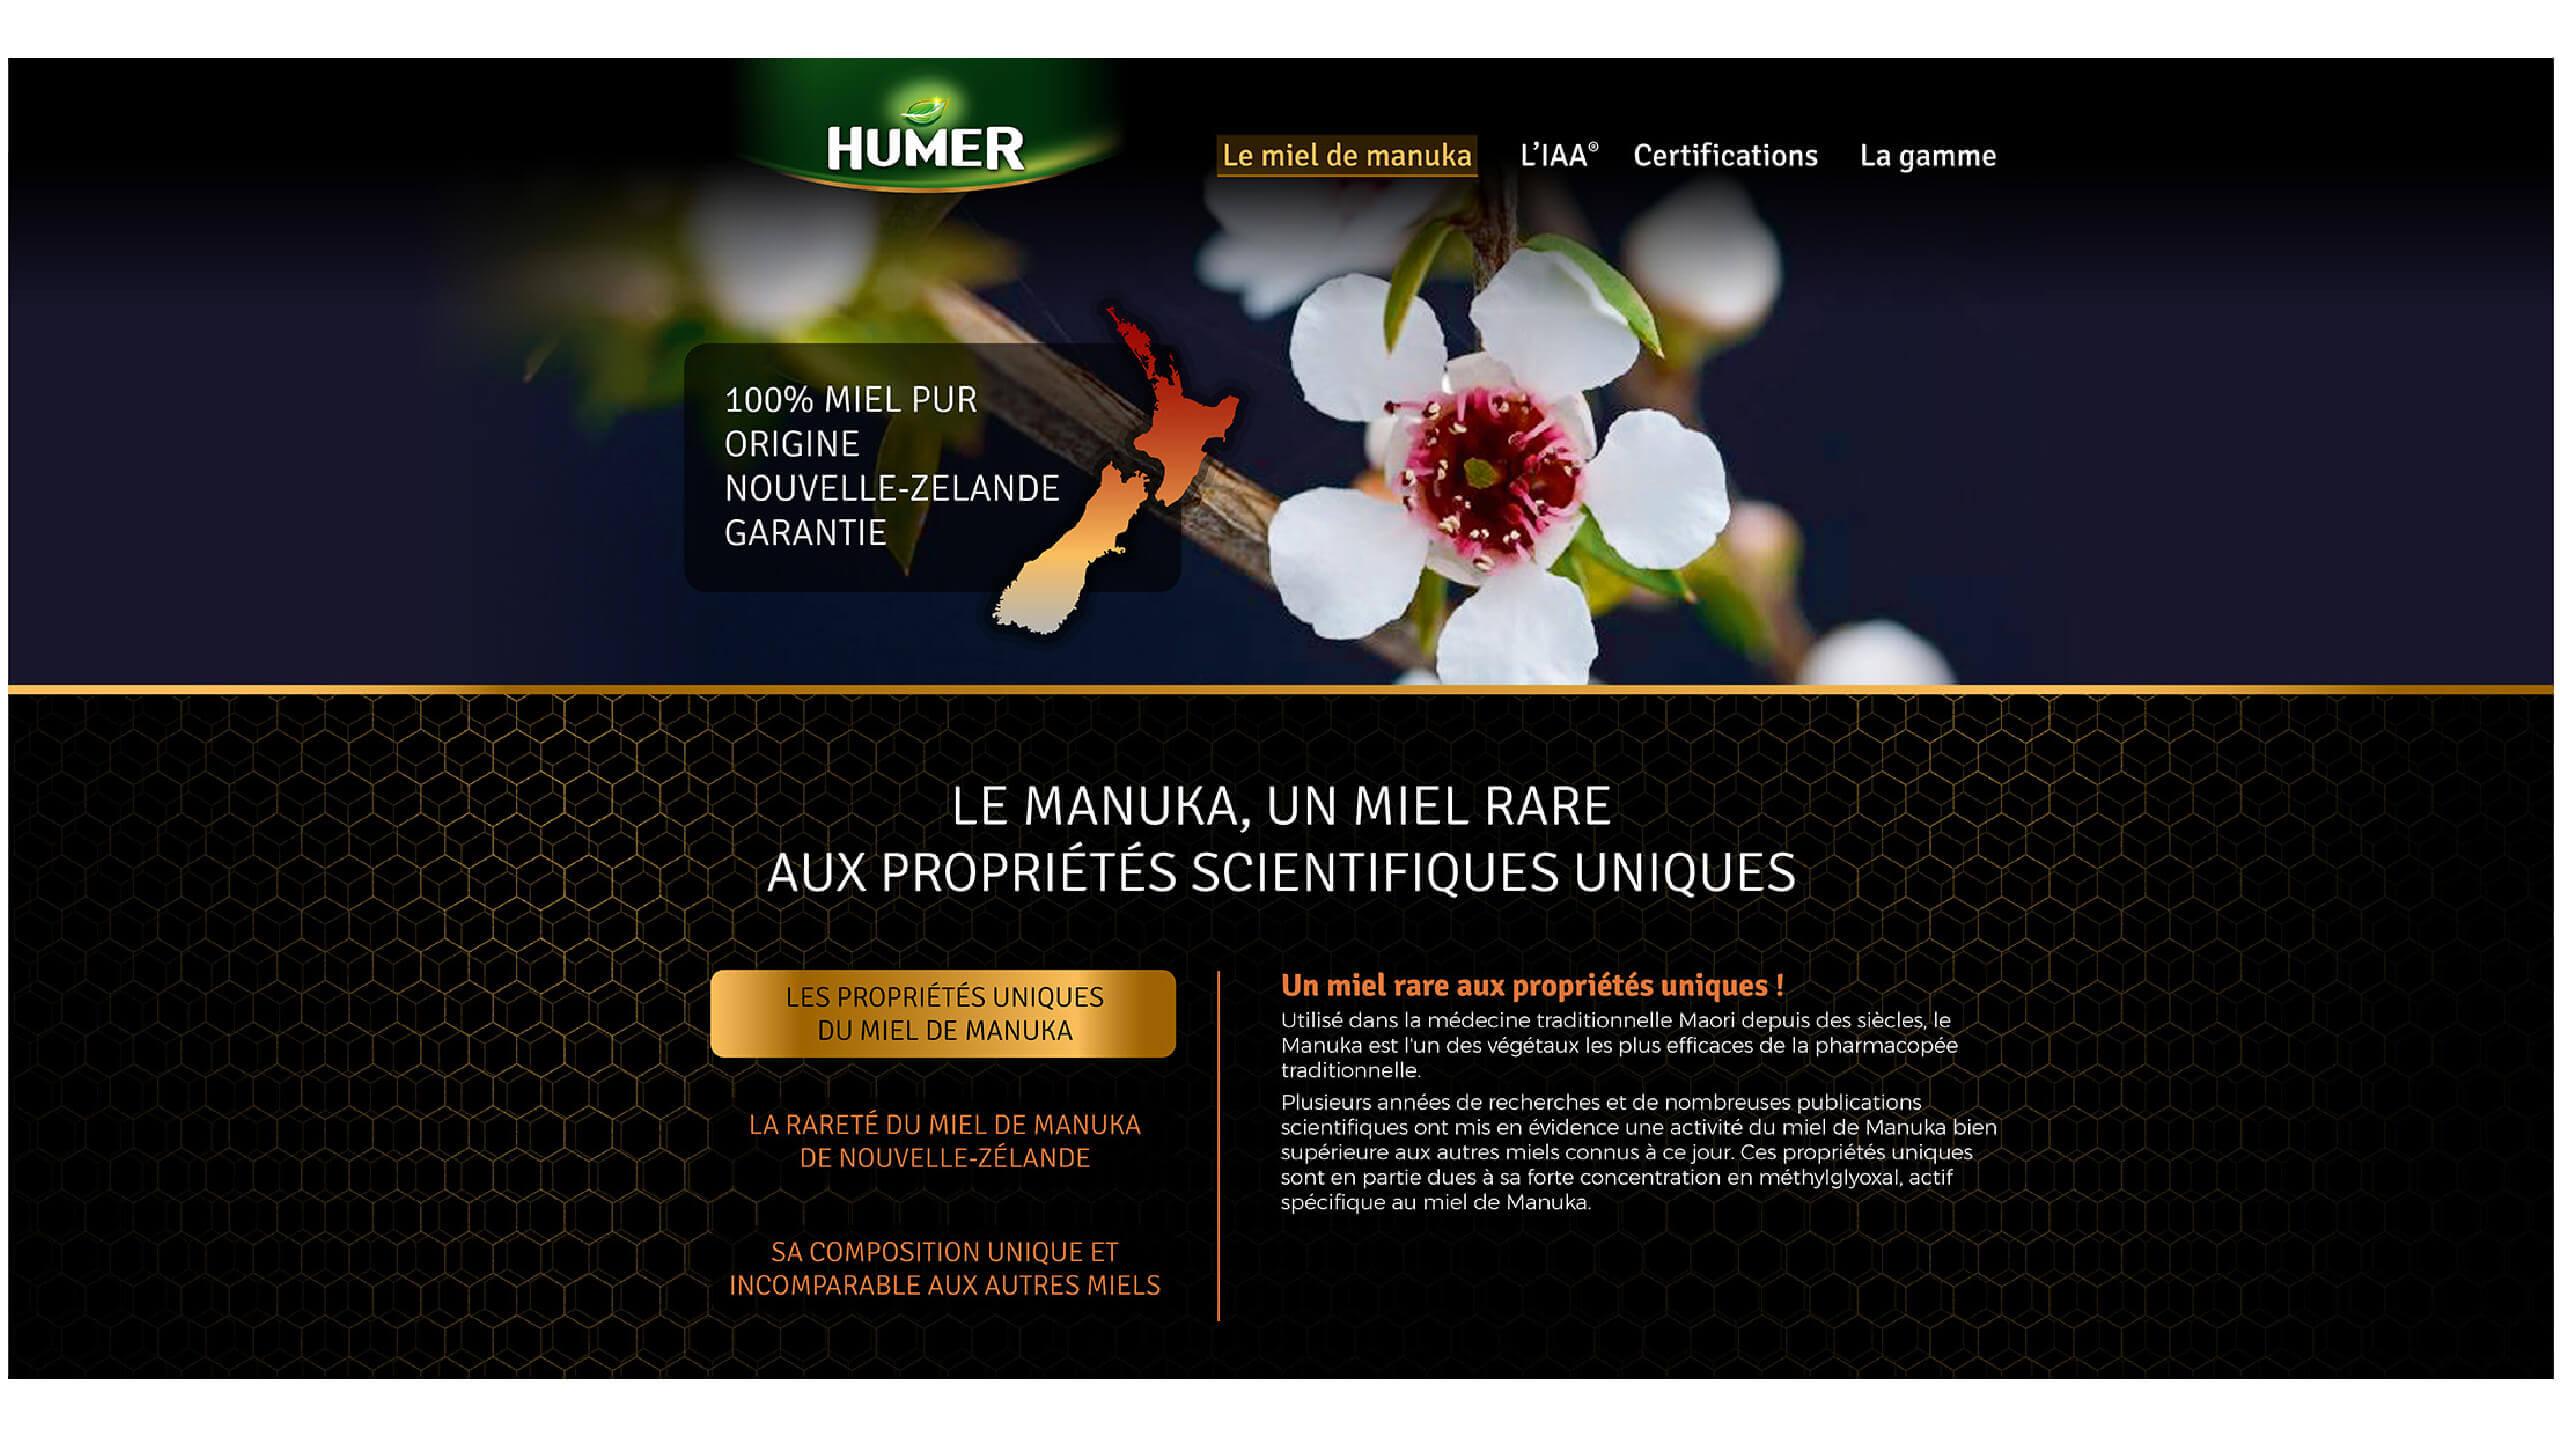 homepage du site internet humer